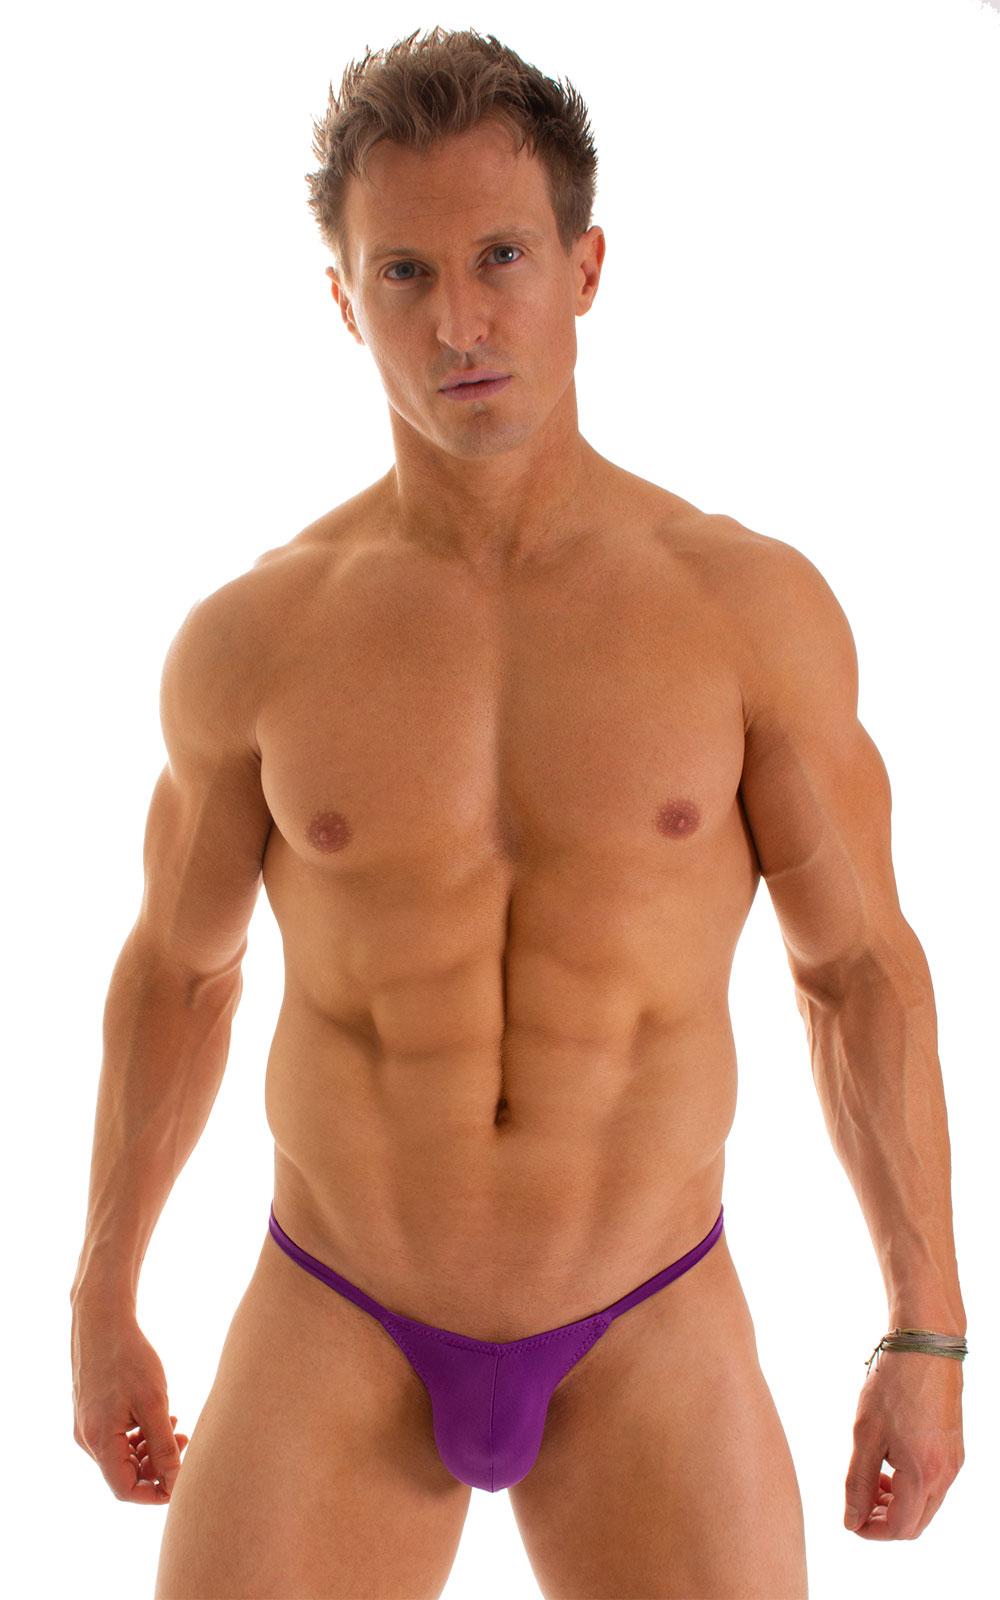 Micro Pouch - Puckered Back - Rio Bikini in ThinSkinz Grape 1